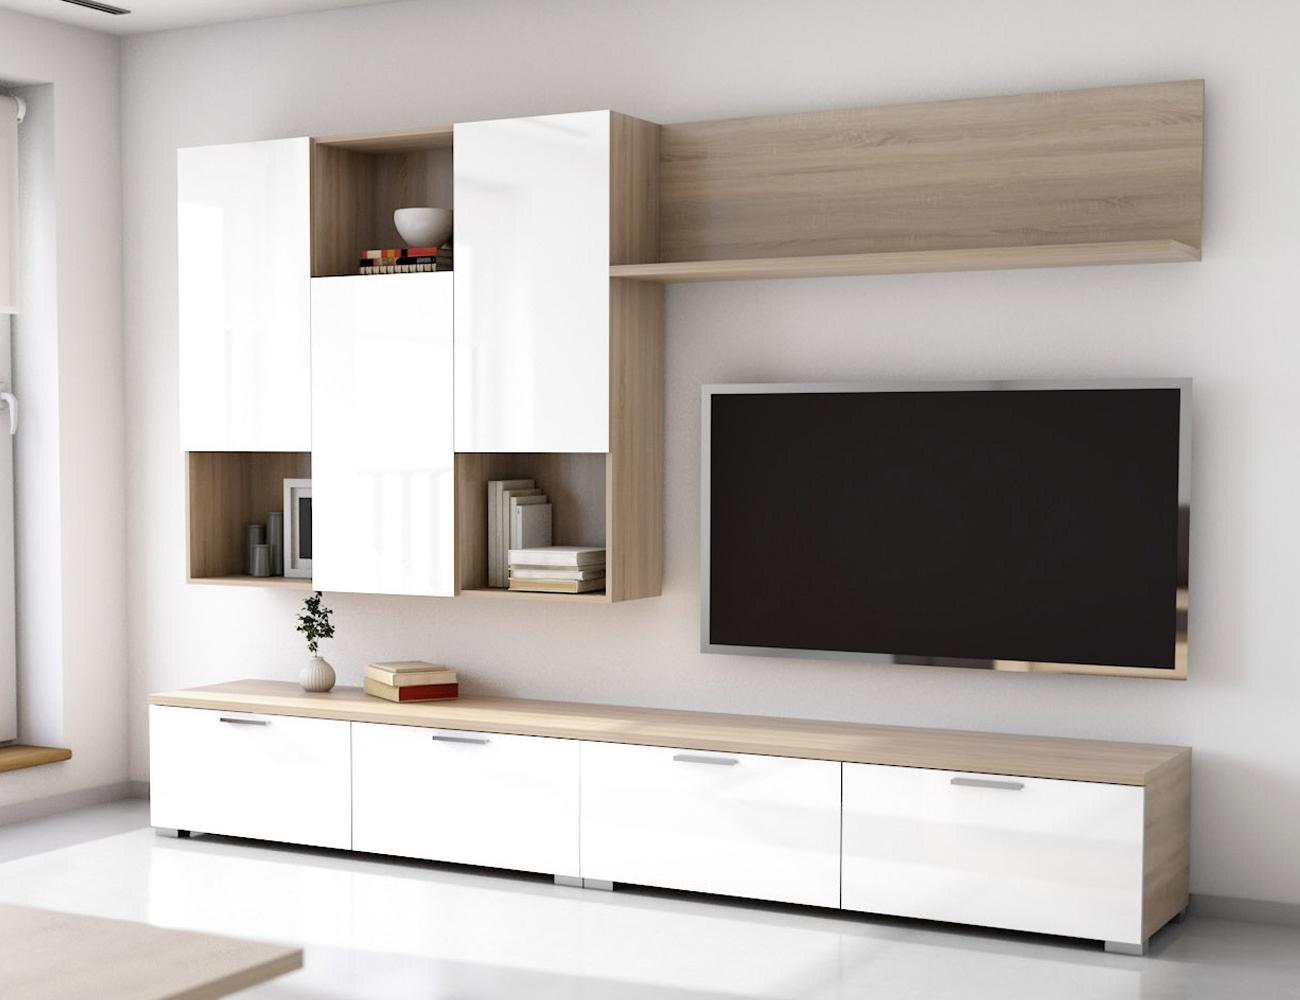 Muebles Salon Blanco Y Madera E9dx Mueble De Salà N Edor Estilo Moderno Roble Con Blanco 4280